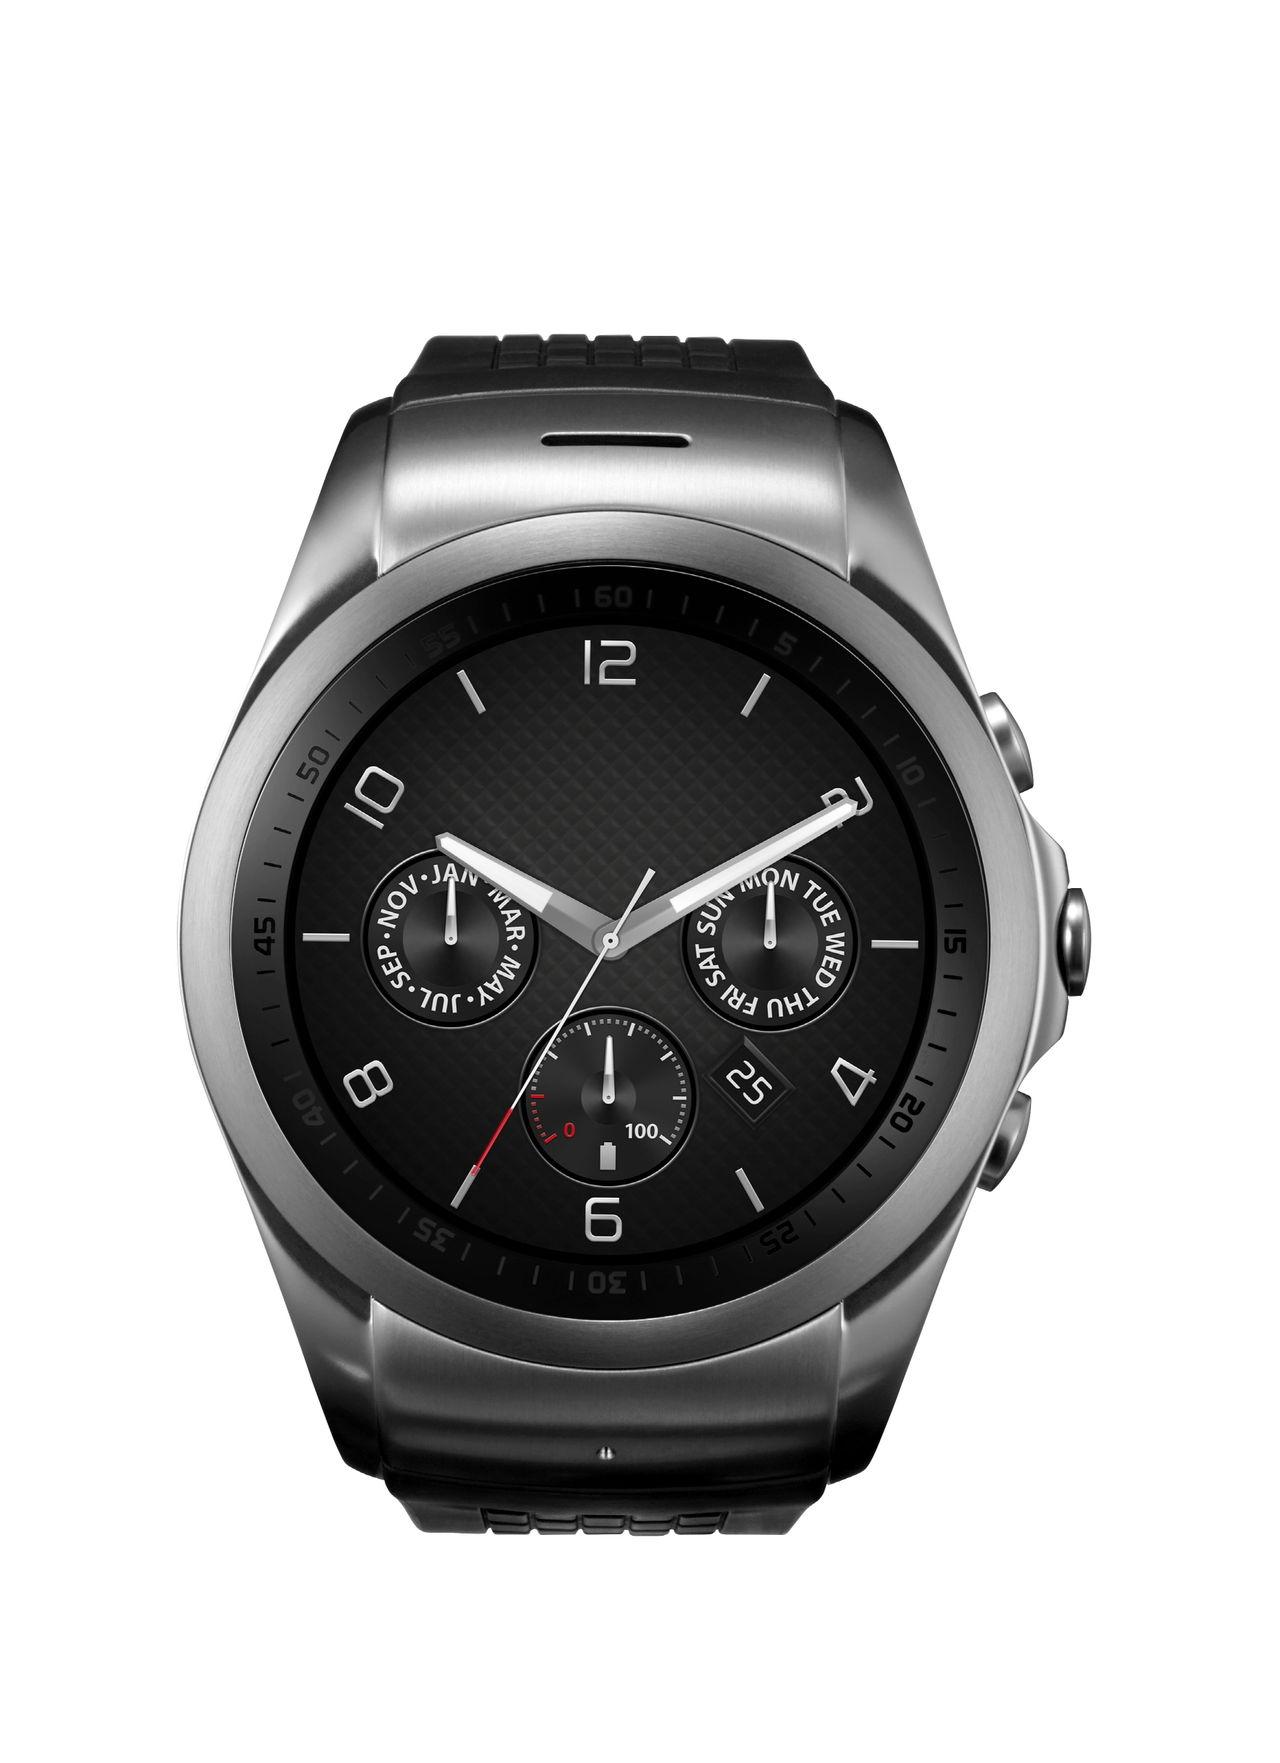 Svenskt pris på LG Watch Urbane